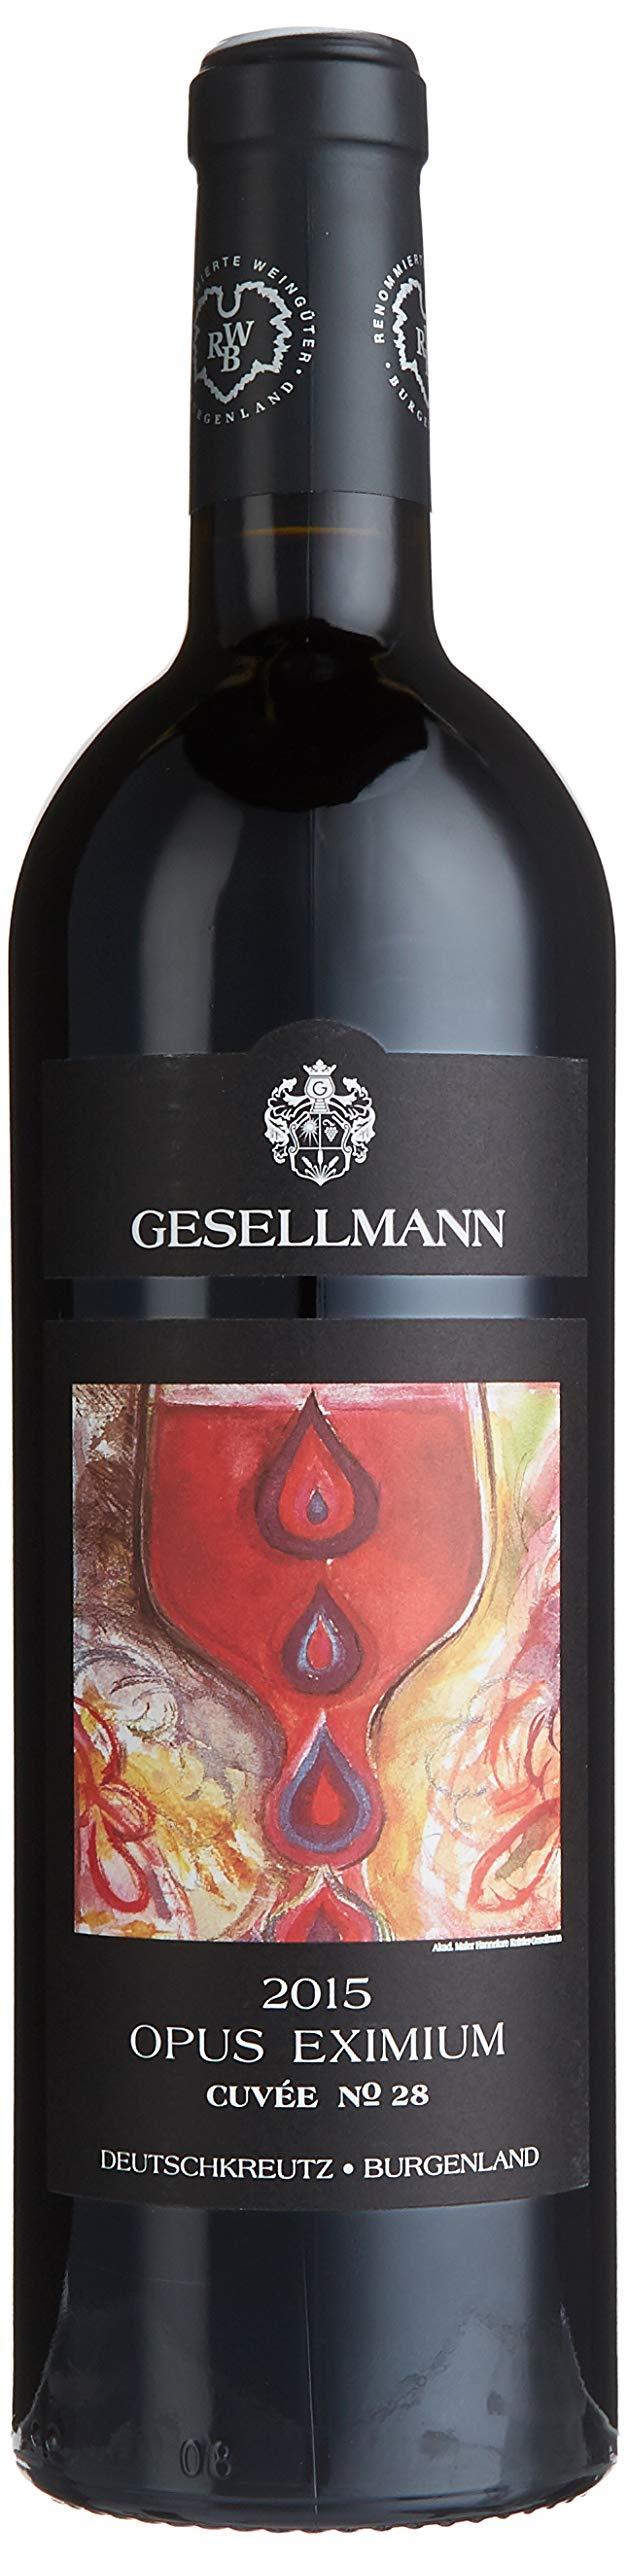 Gesellmann-Op-Eximium-N28-2016